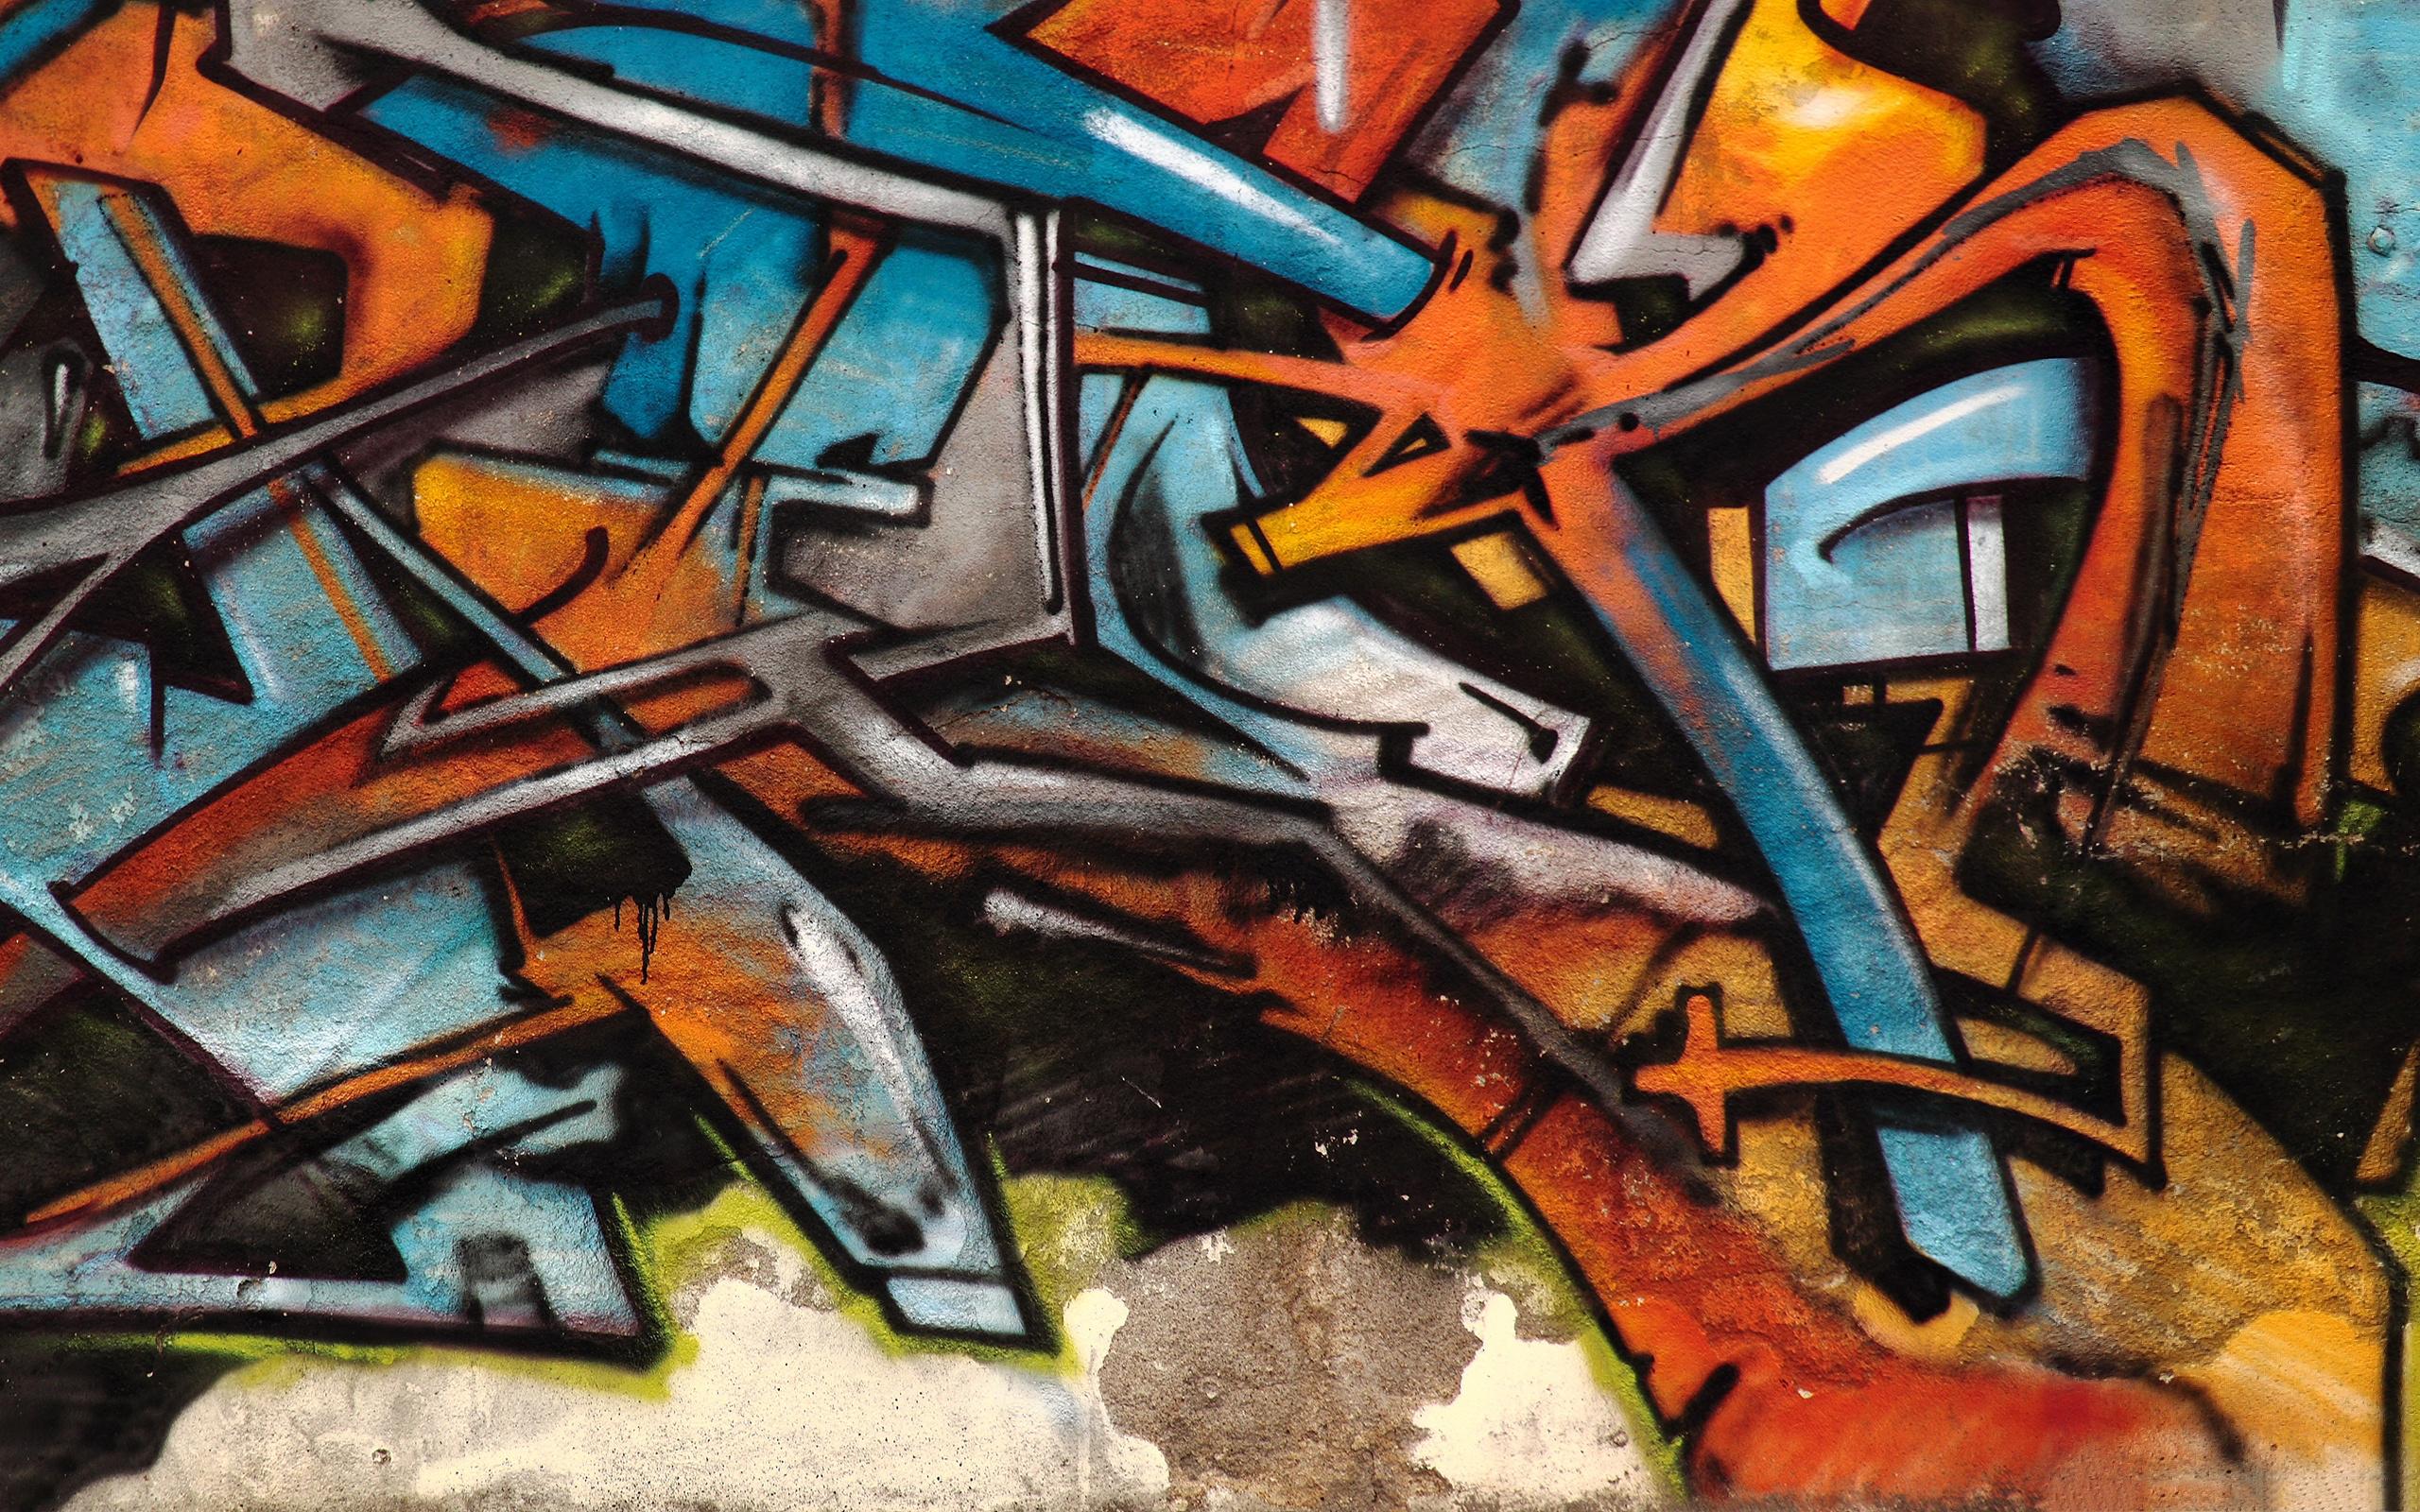 Android Wallpaper: Graffiti